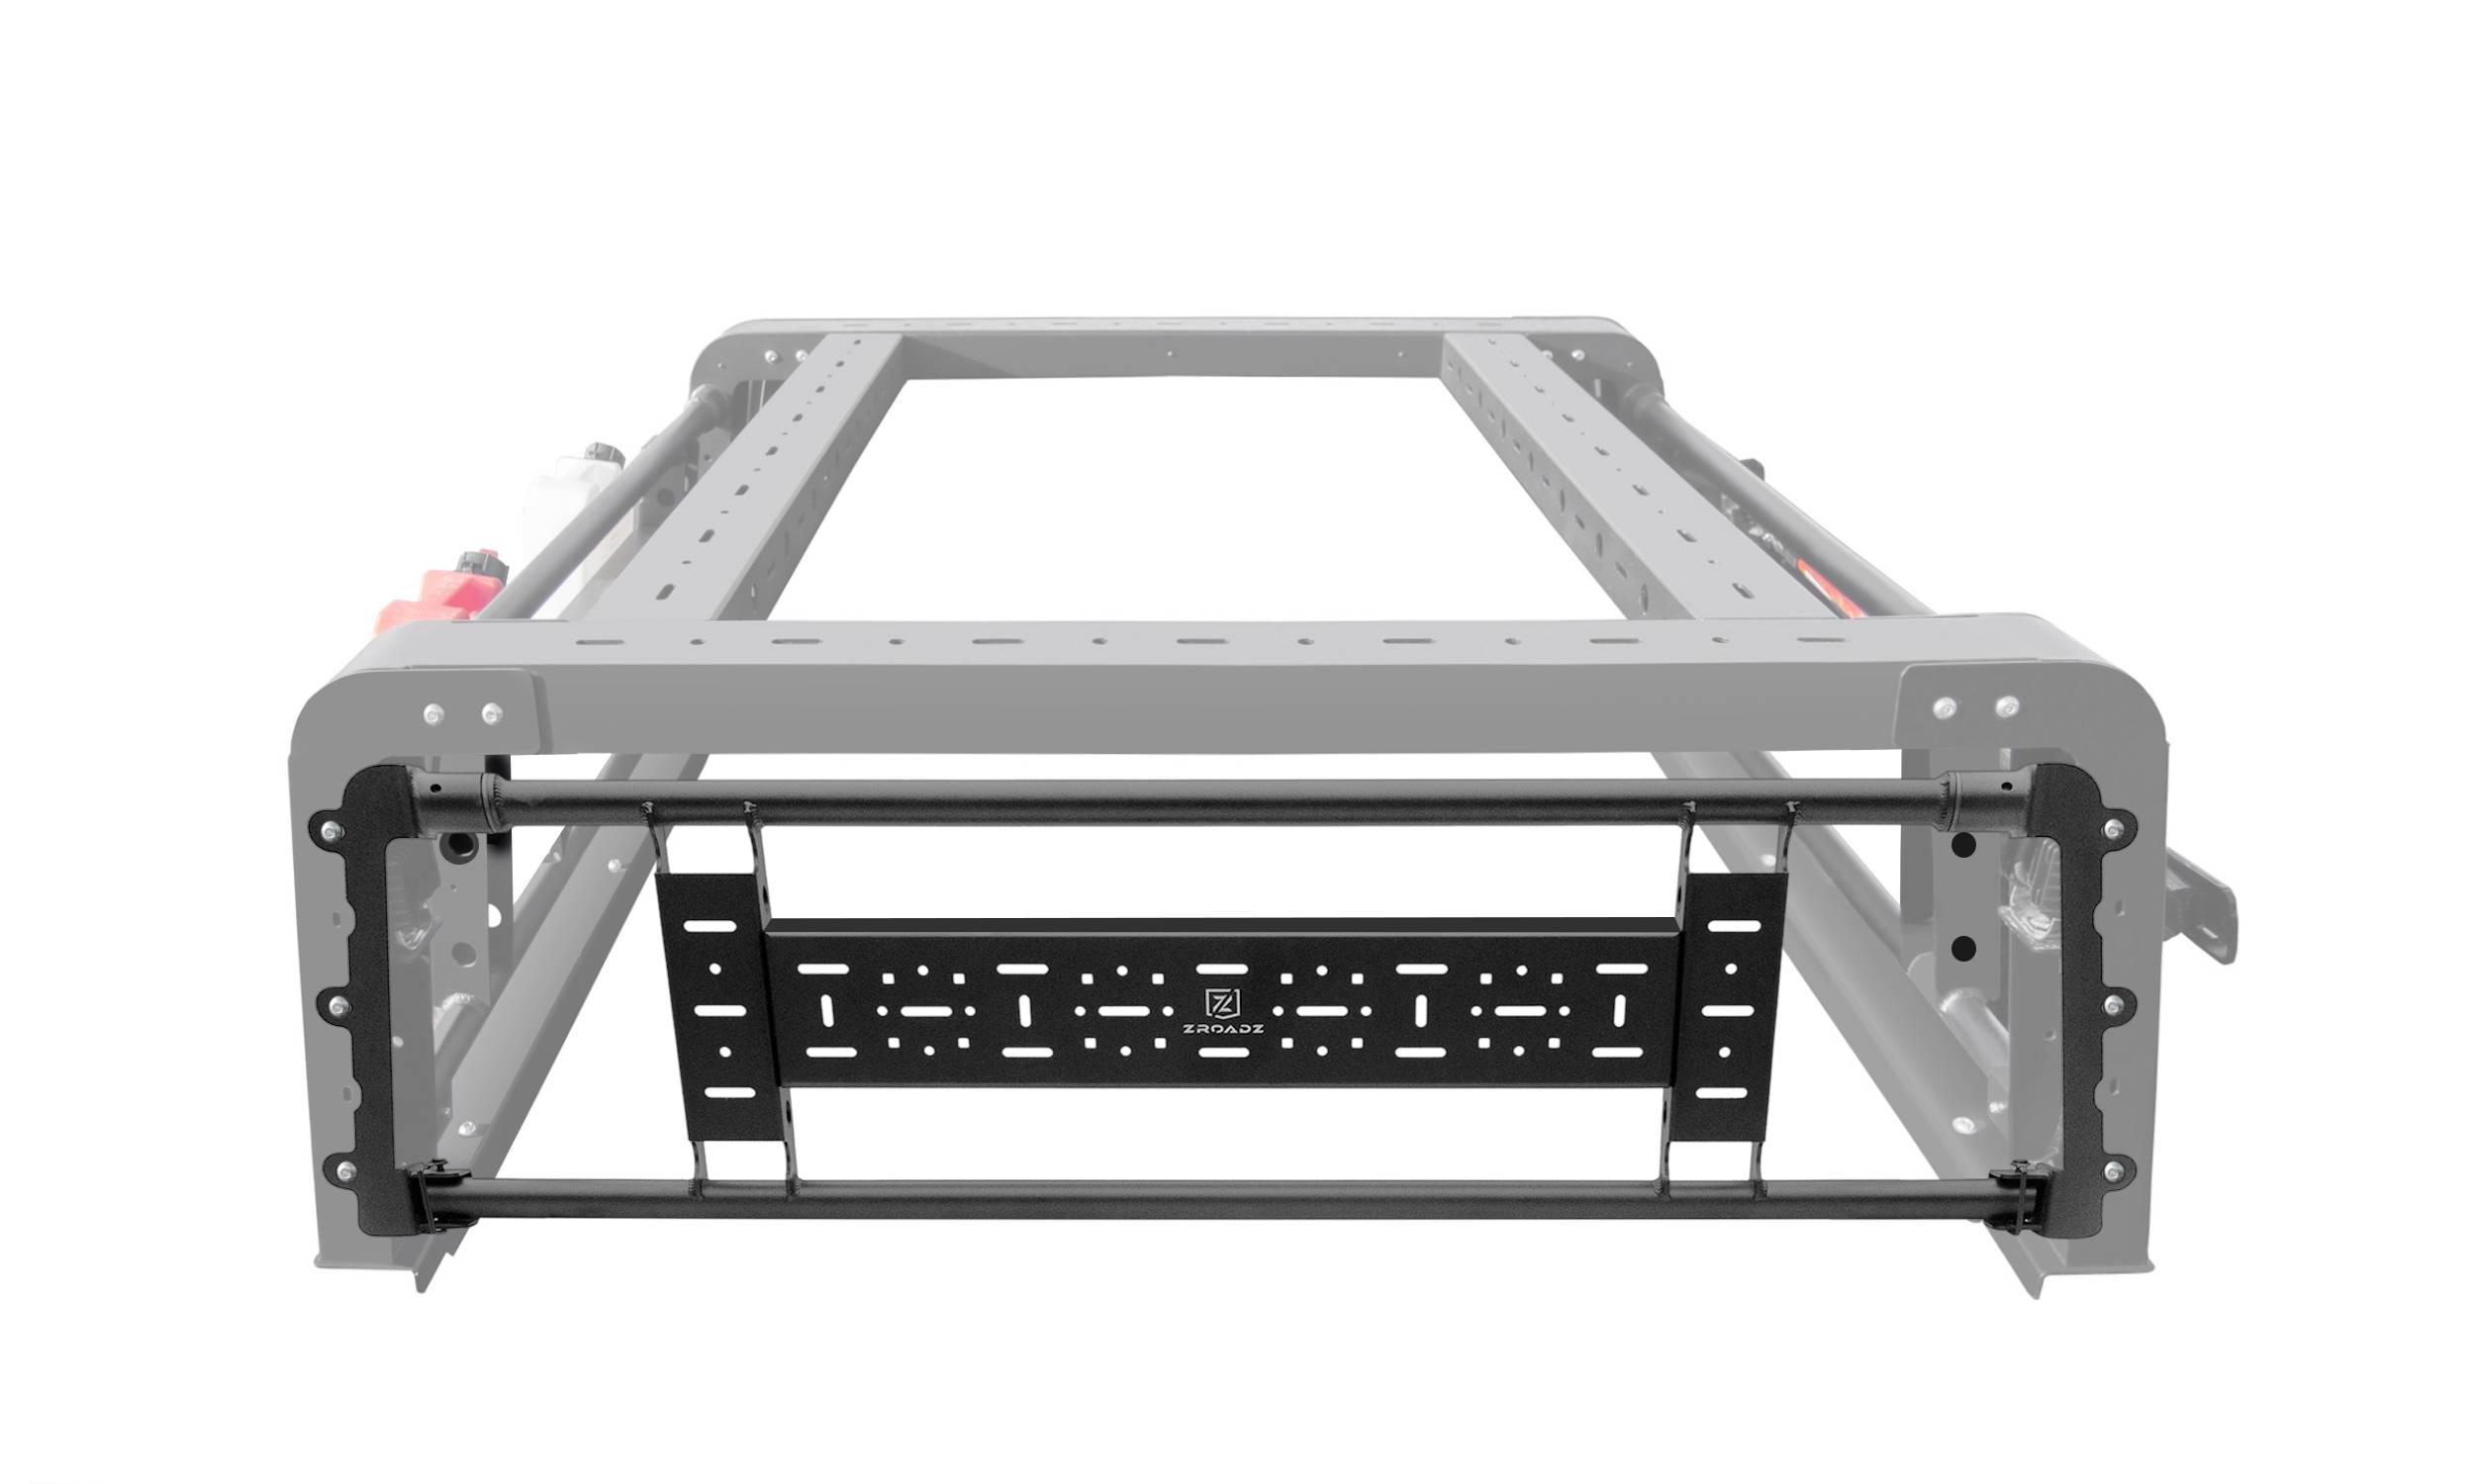 ZROADZ                                             - 2019-2021 Jeep Gladiator Access Overland Rack Rear Gate - PN #Z834001